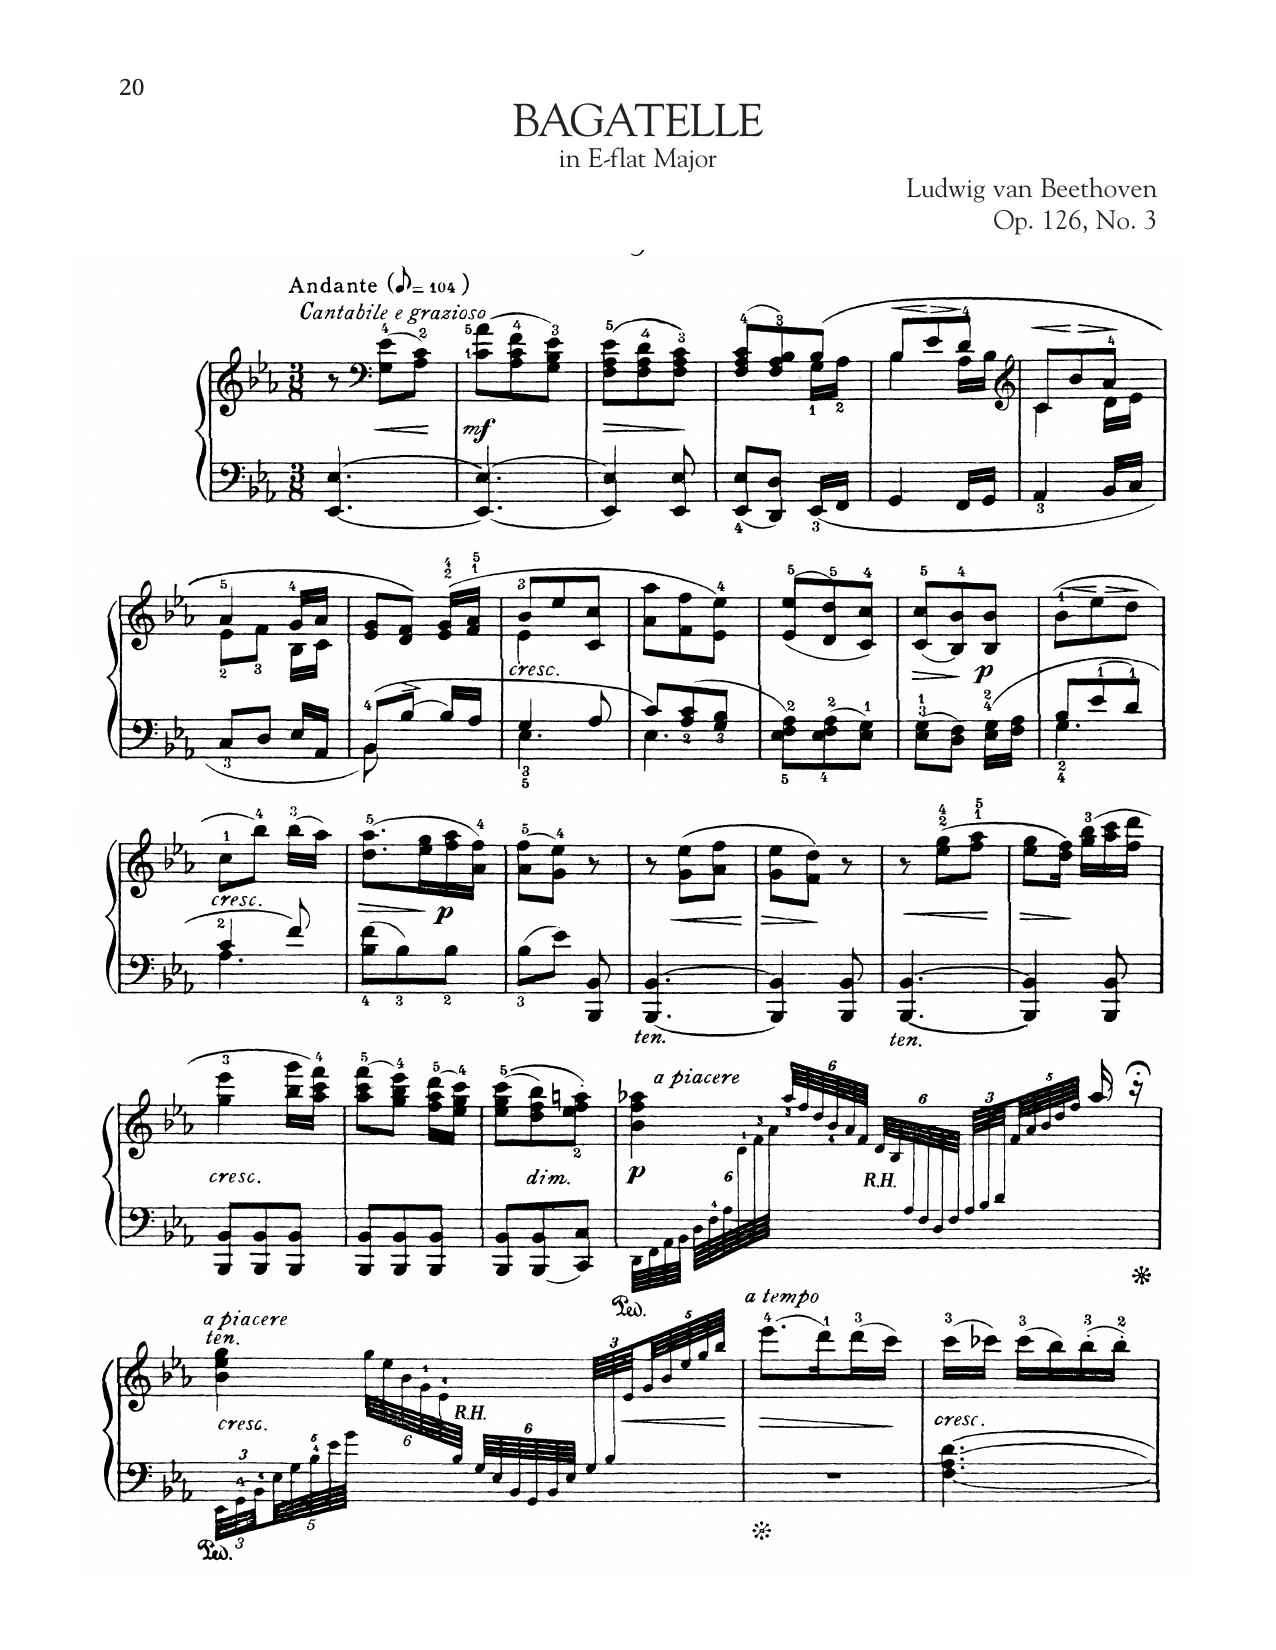 Bagatelle In E-Flat Major, Op. 126, No. 3 (Piano Solo)